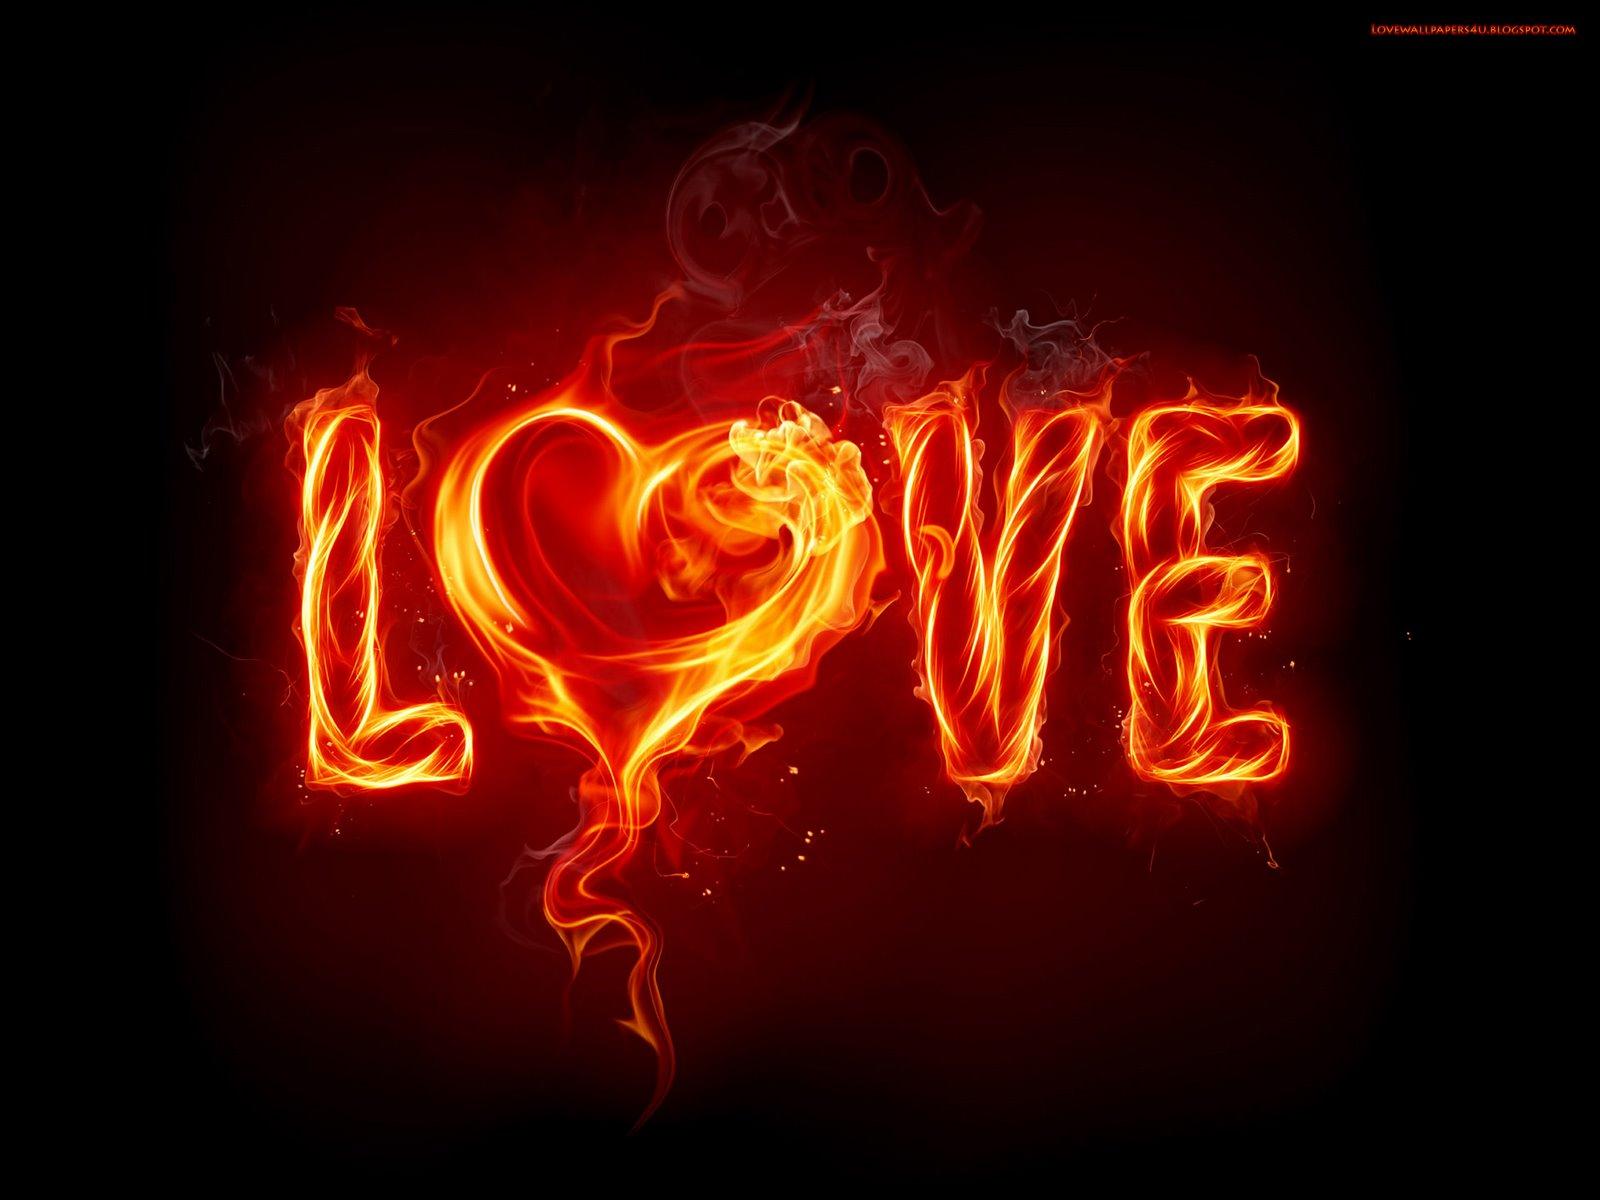 10 romantic love wallpapers